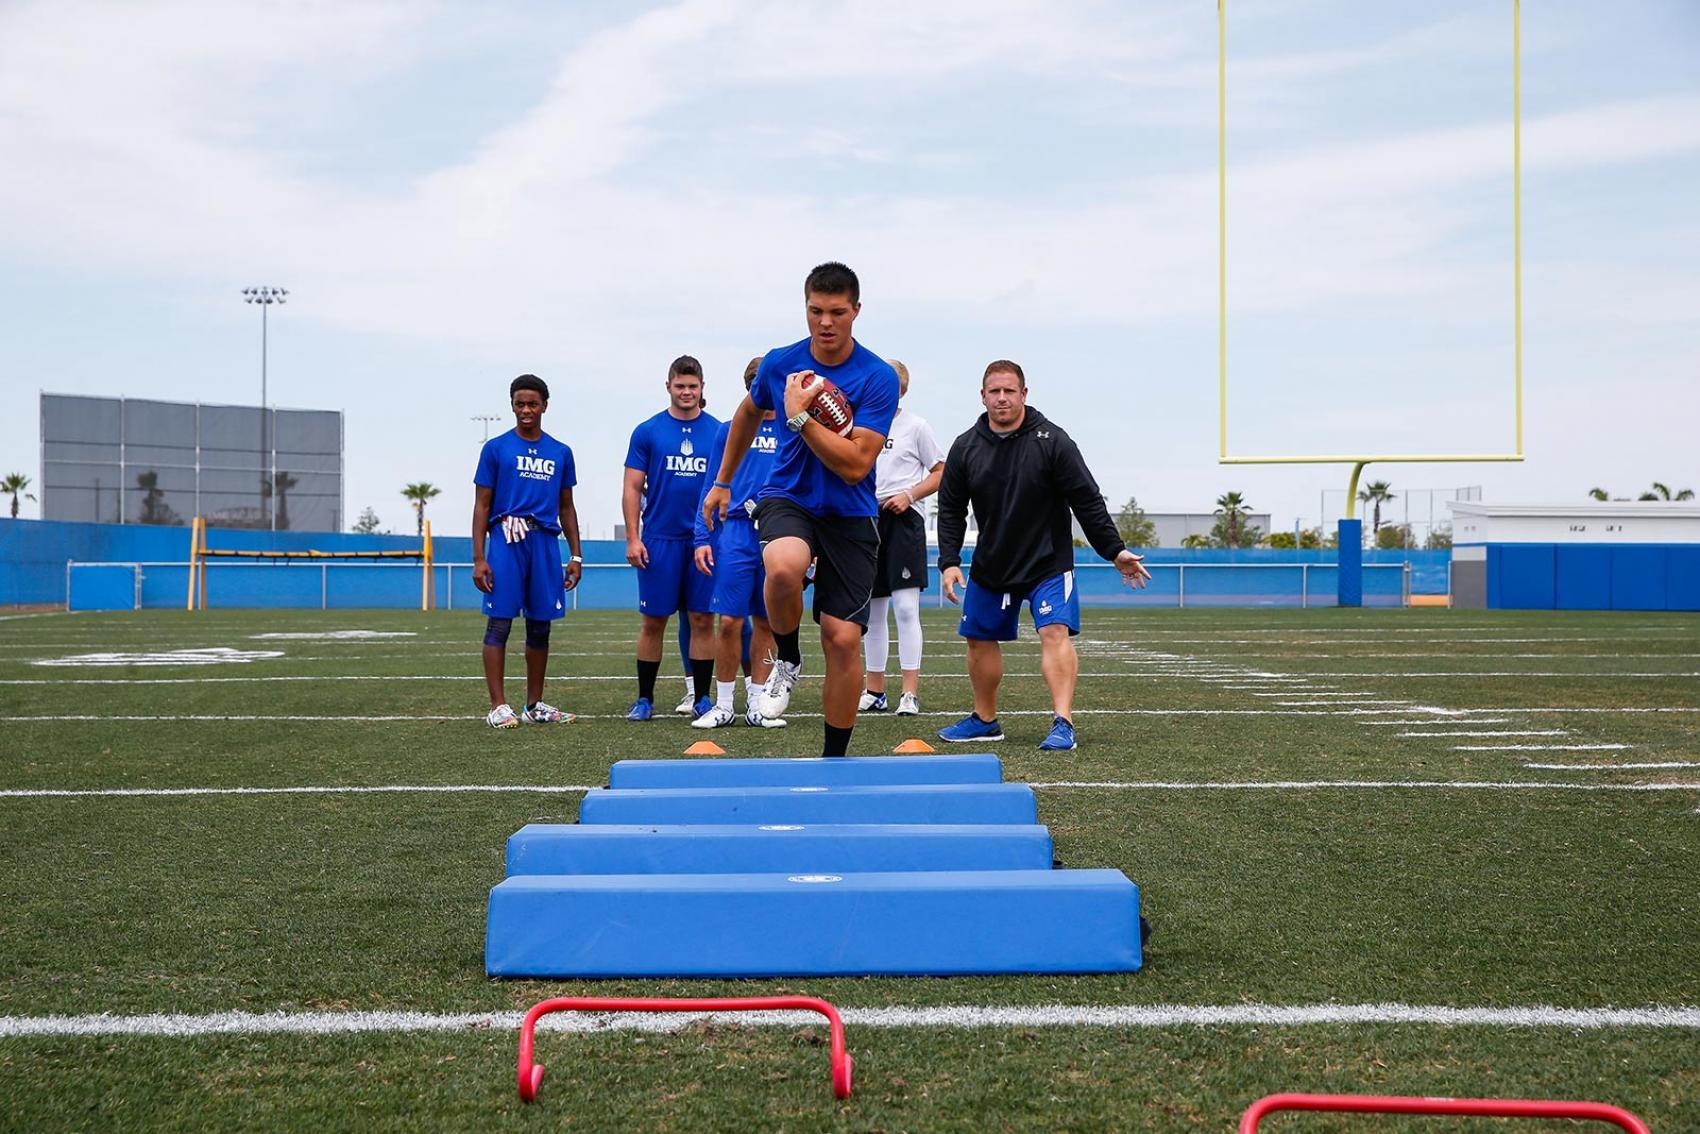 Football Camps - Football Training | IMG Academy 2019